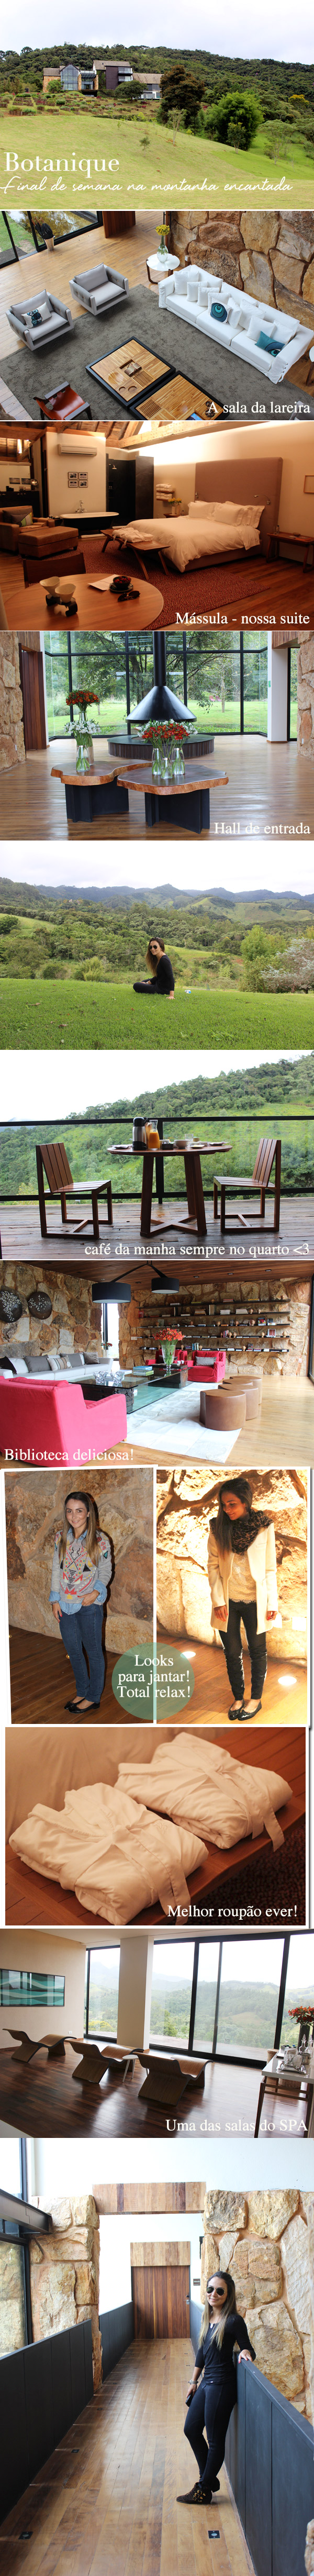 botanique-hotel-lala-noleto-campos-jordao